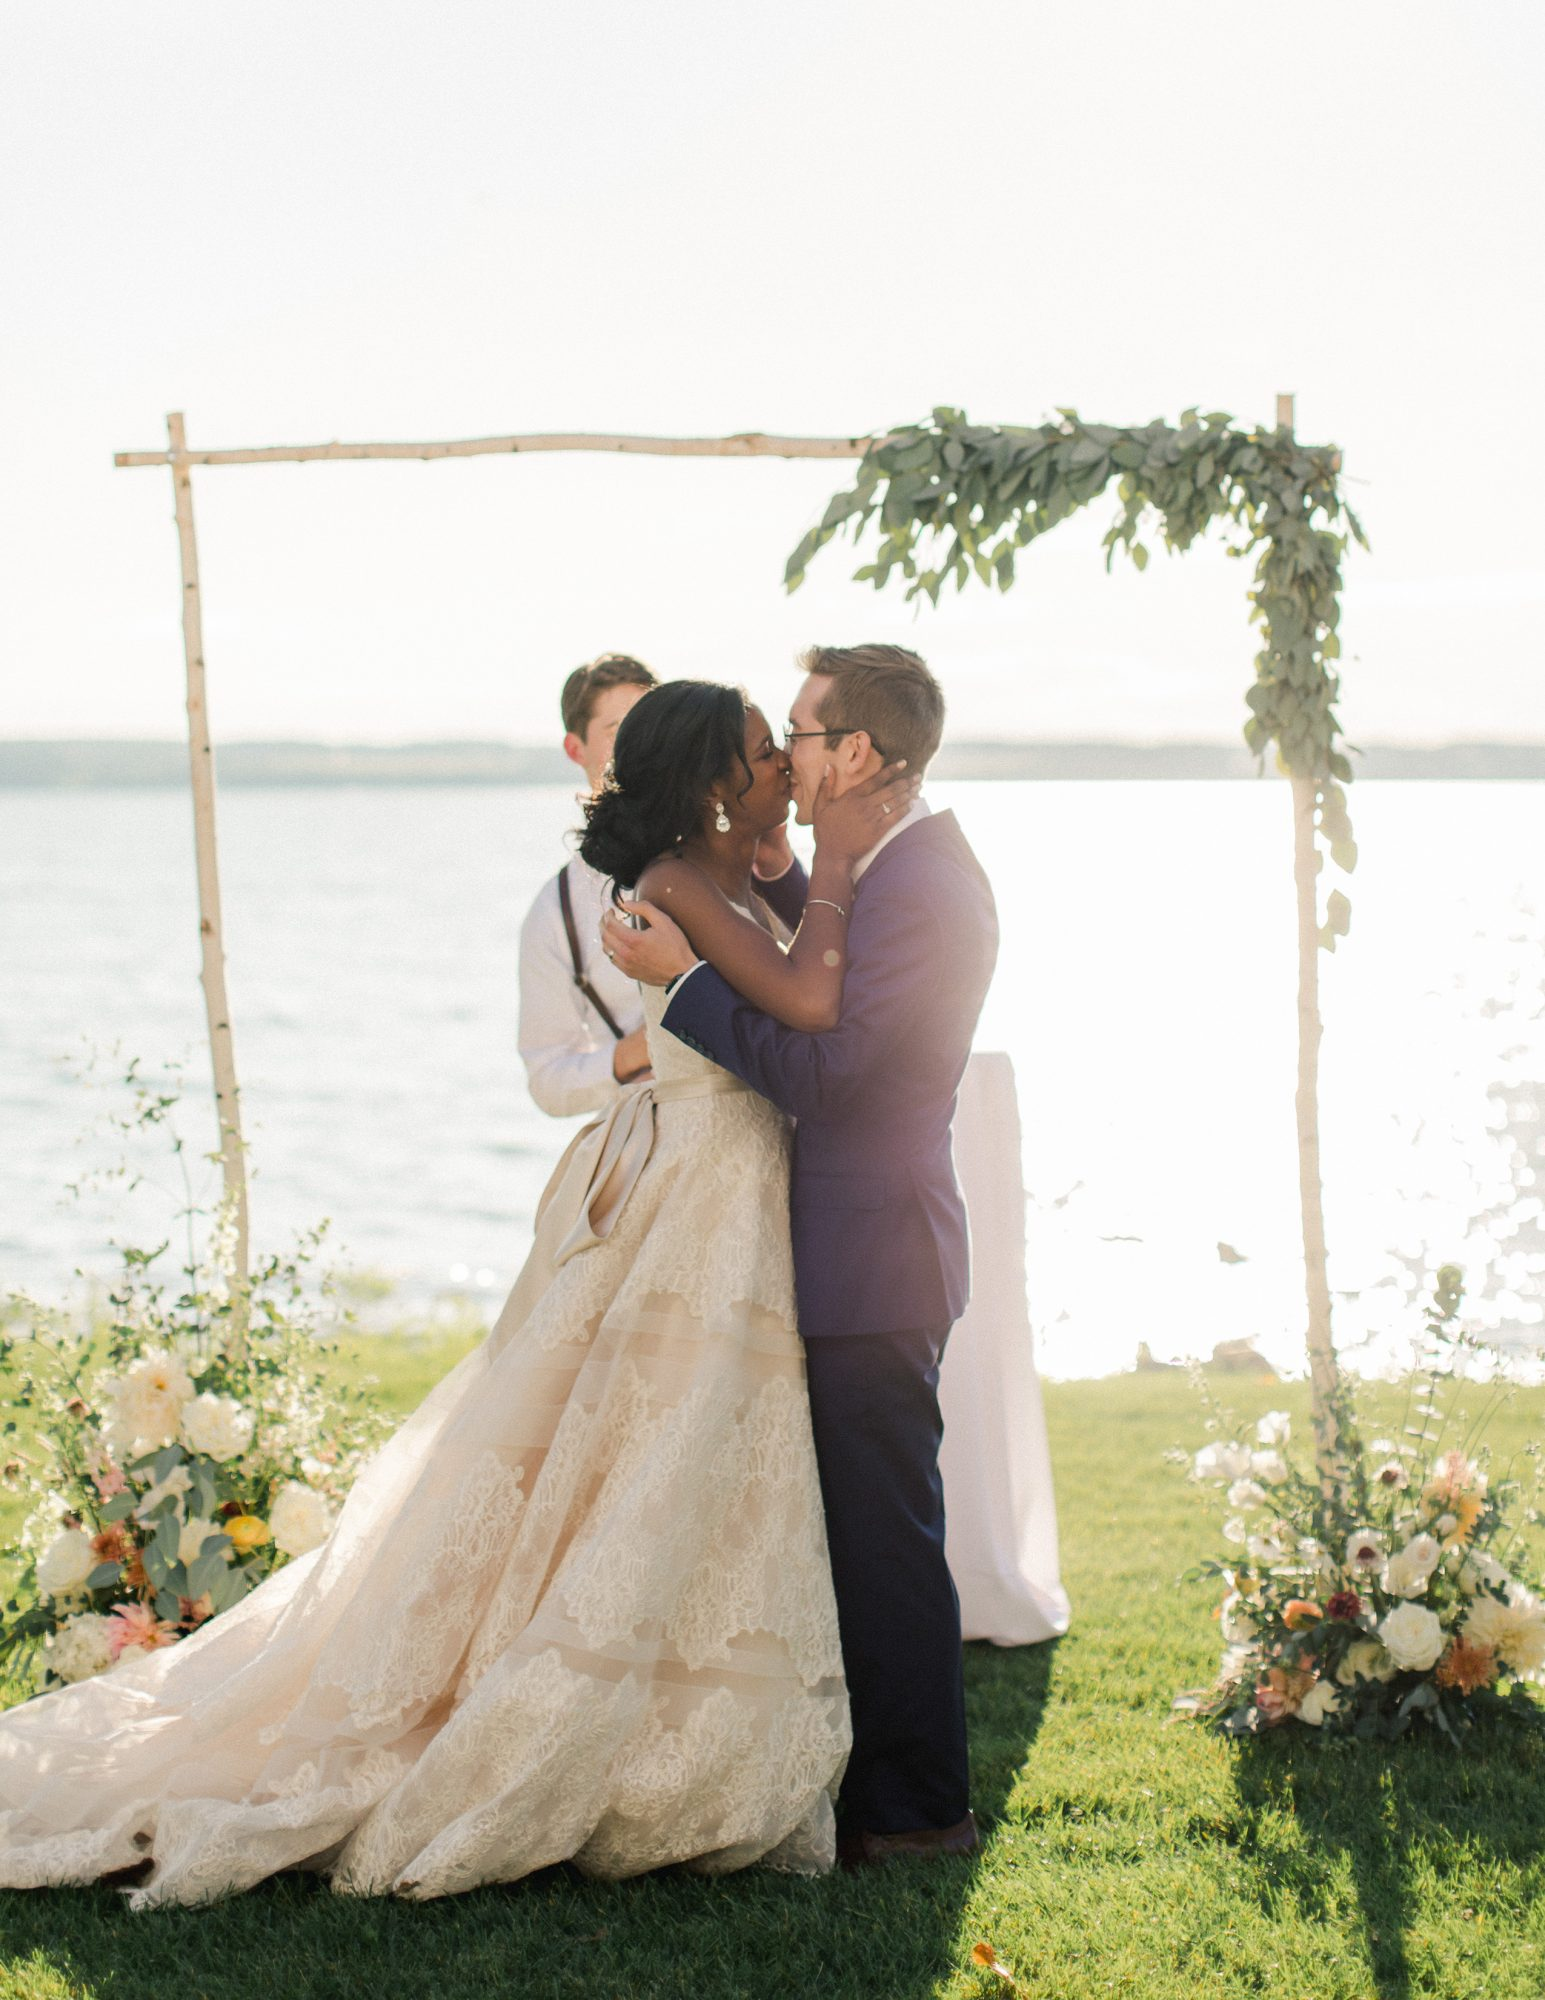 charlene jeremy wedding ceremony kiss